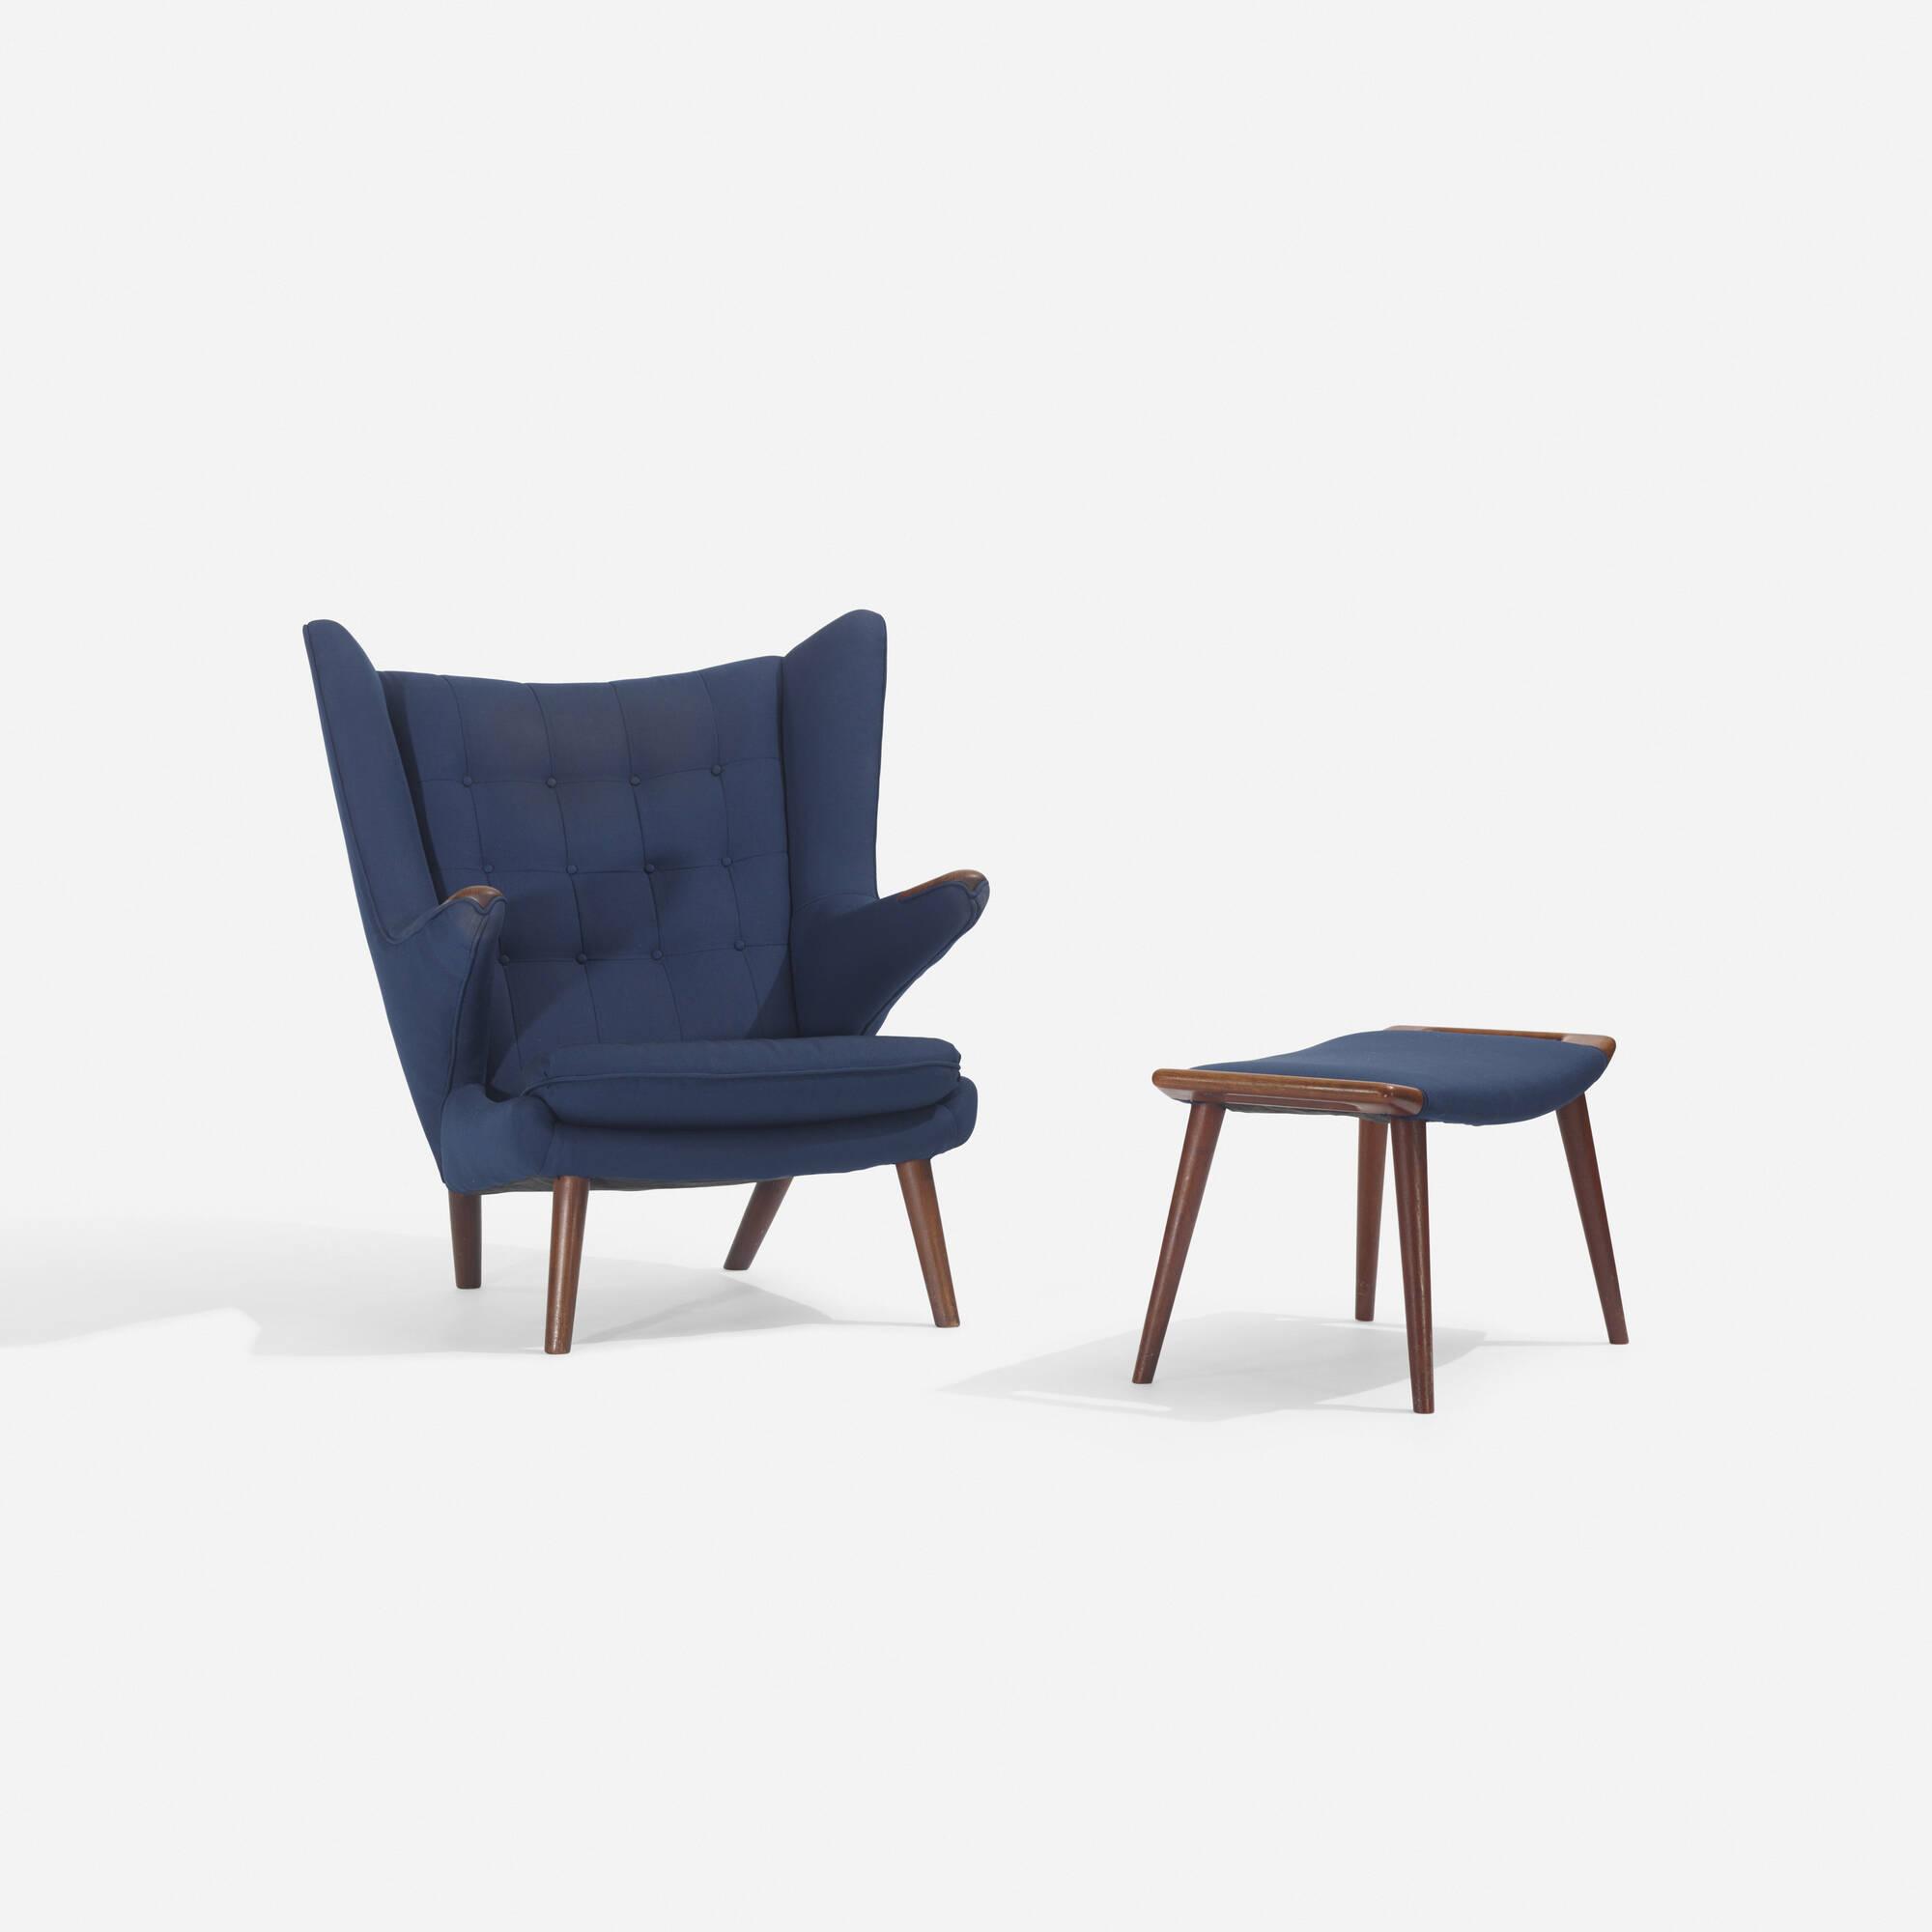 126: Hans J. Wegner / Papa Bear chair and ottoman (2 of 3)